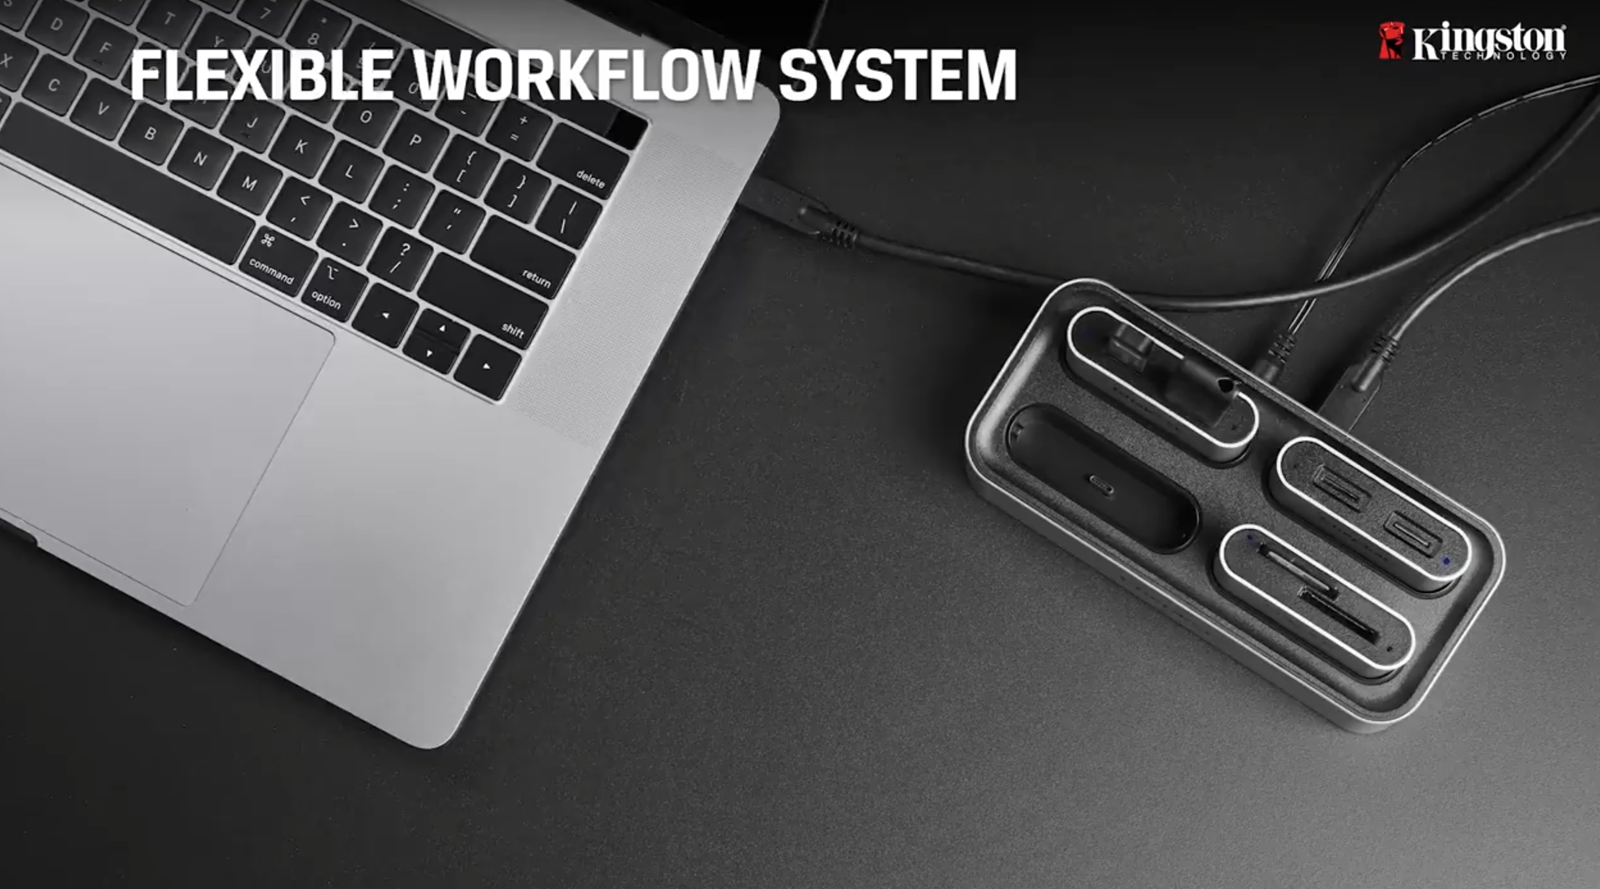 [CES 2021] 金士頓 2021 年度新品 Workflow Station 讀卡機模組座、NVMe SSD 系列新品齊發,專為高效能工作需求而生 @3C 達人廖阿輝